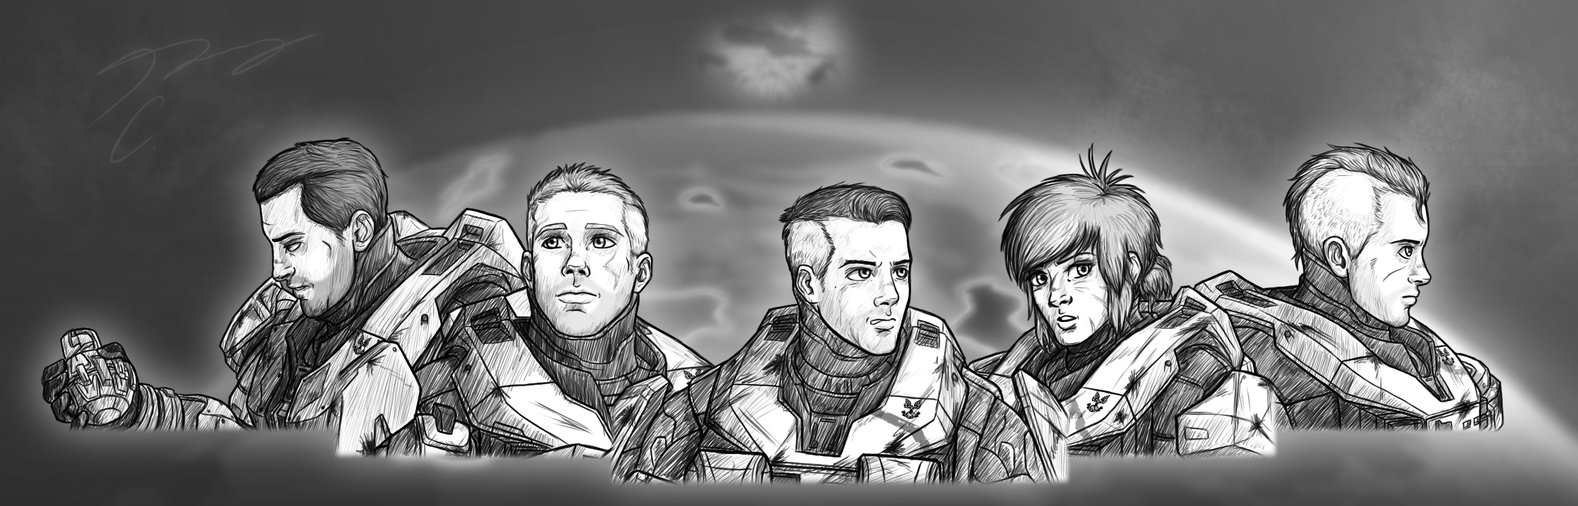 Halo Ammunition - Cover Concept